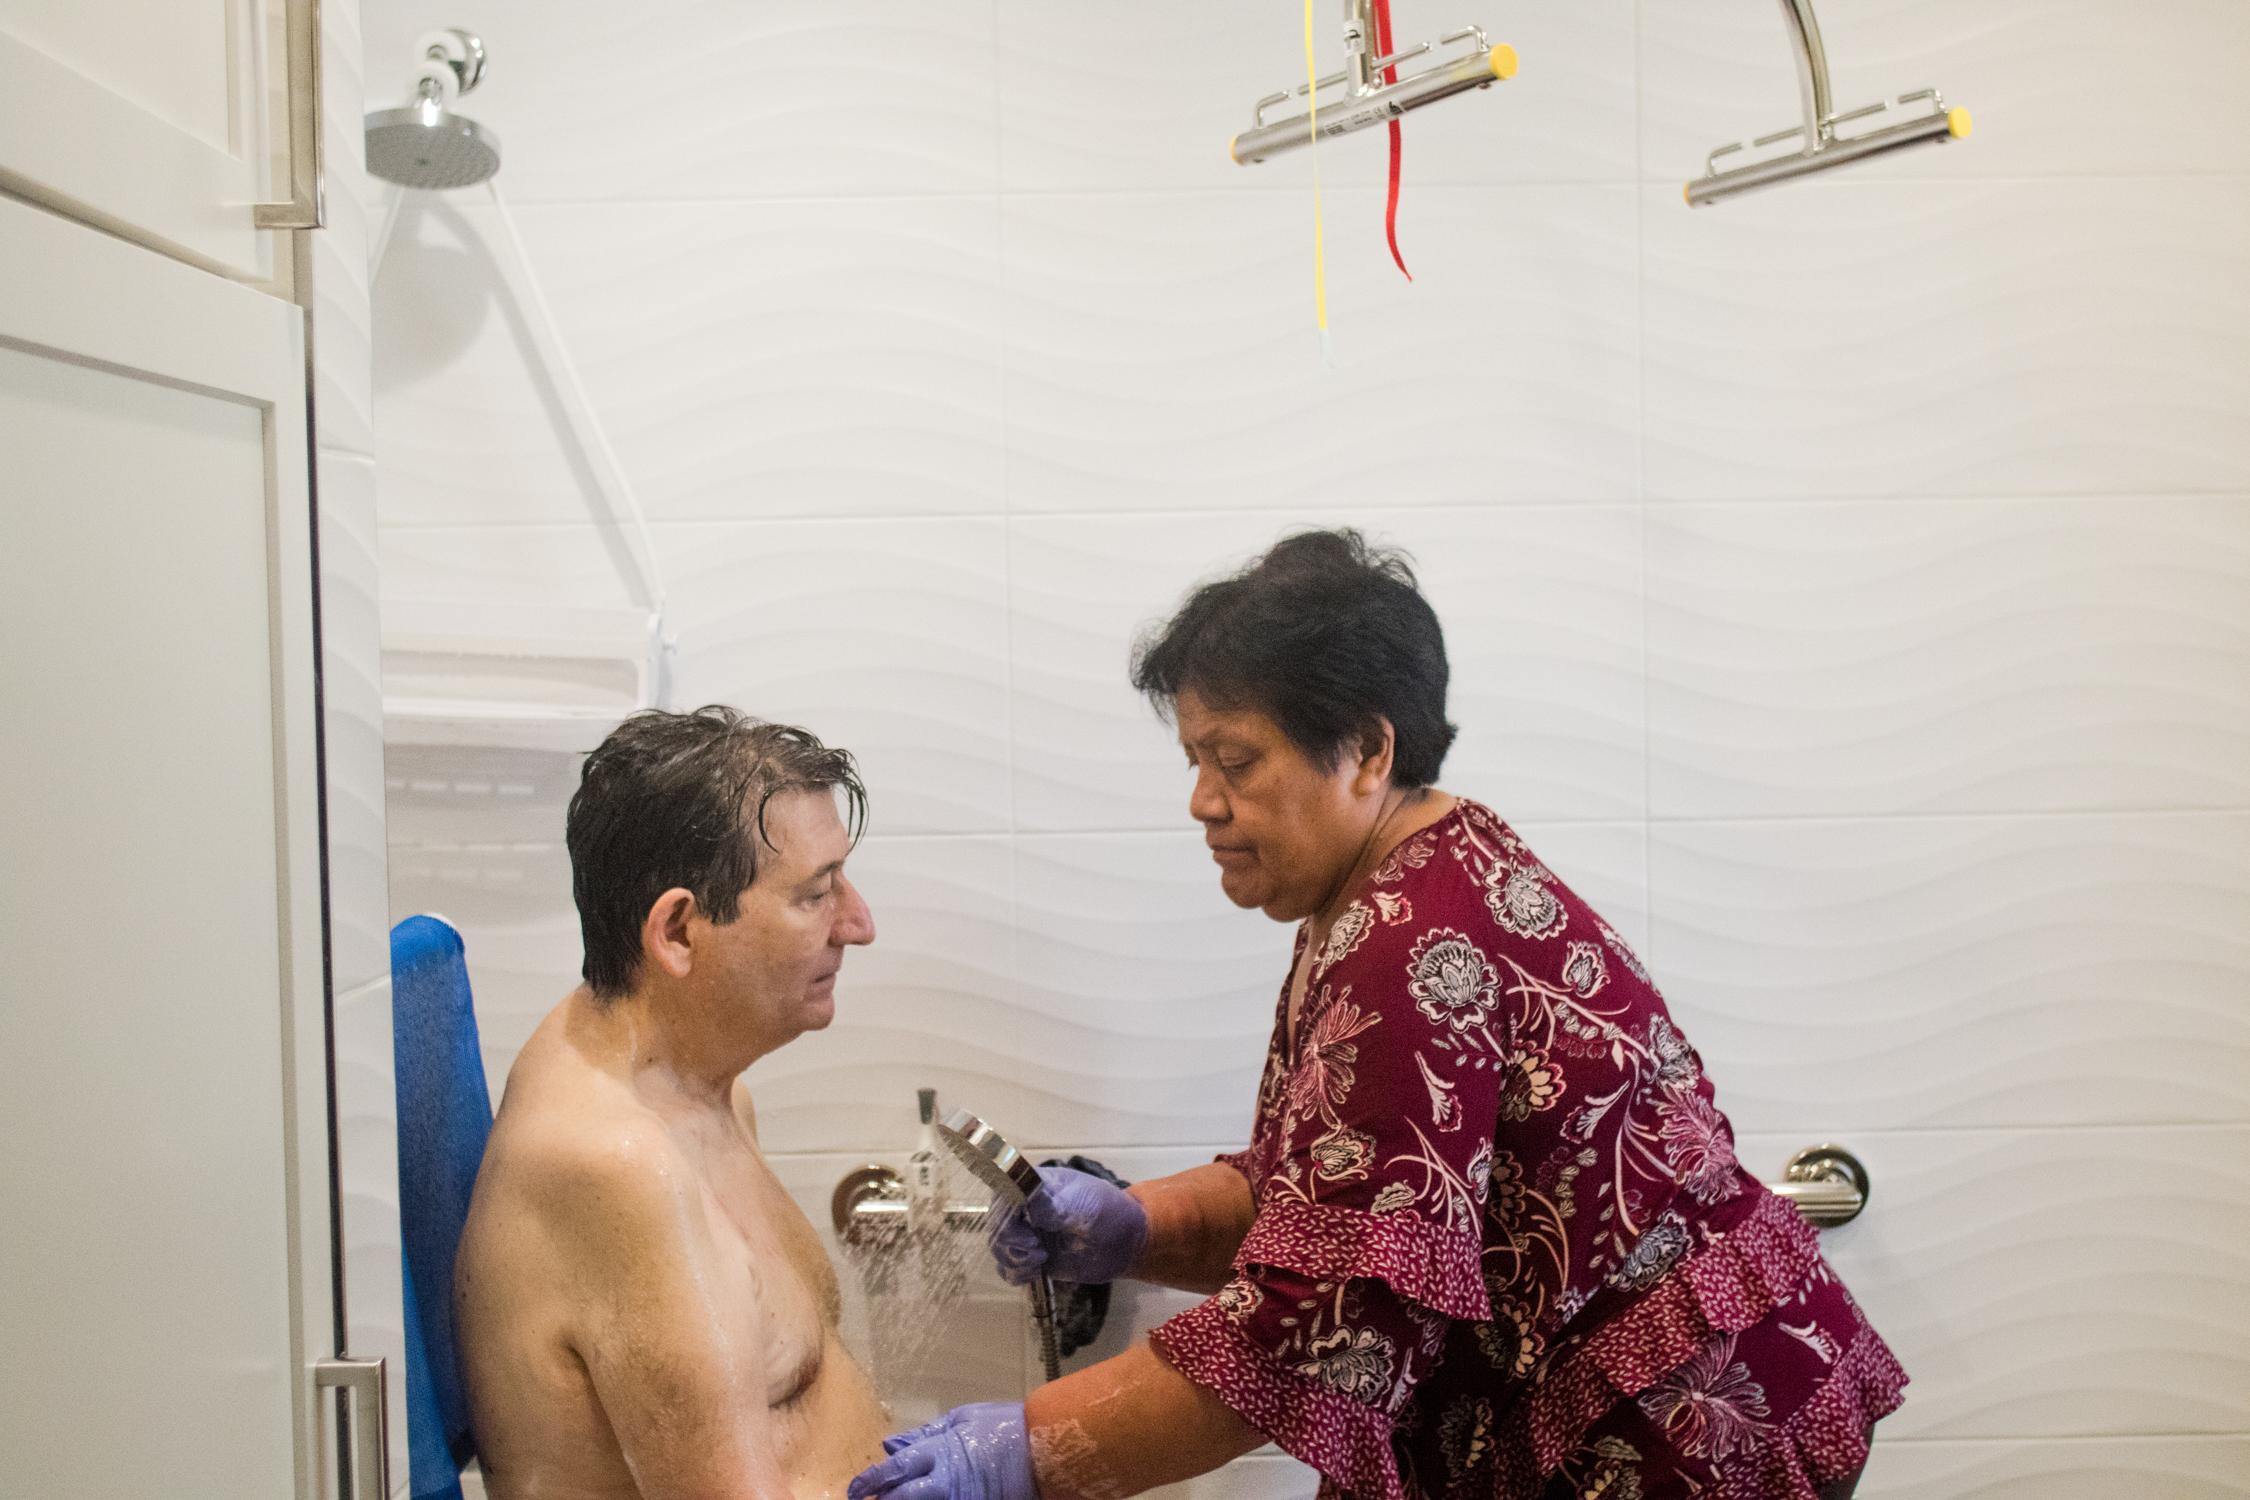 Jon Ferraiolo's caregiver Elisapesi Tautakitaki gives him his daily shower on May 9, 2018.